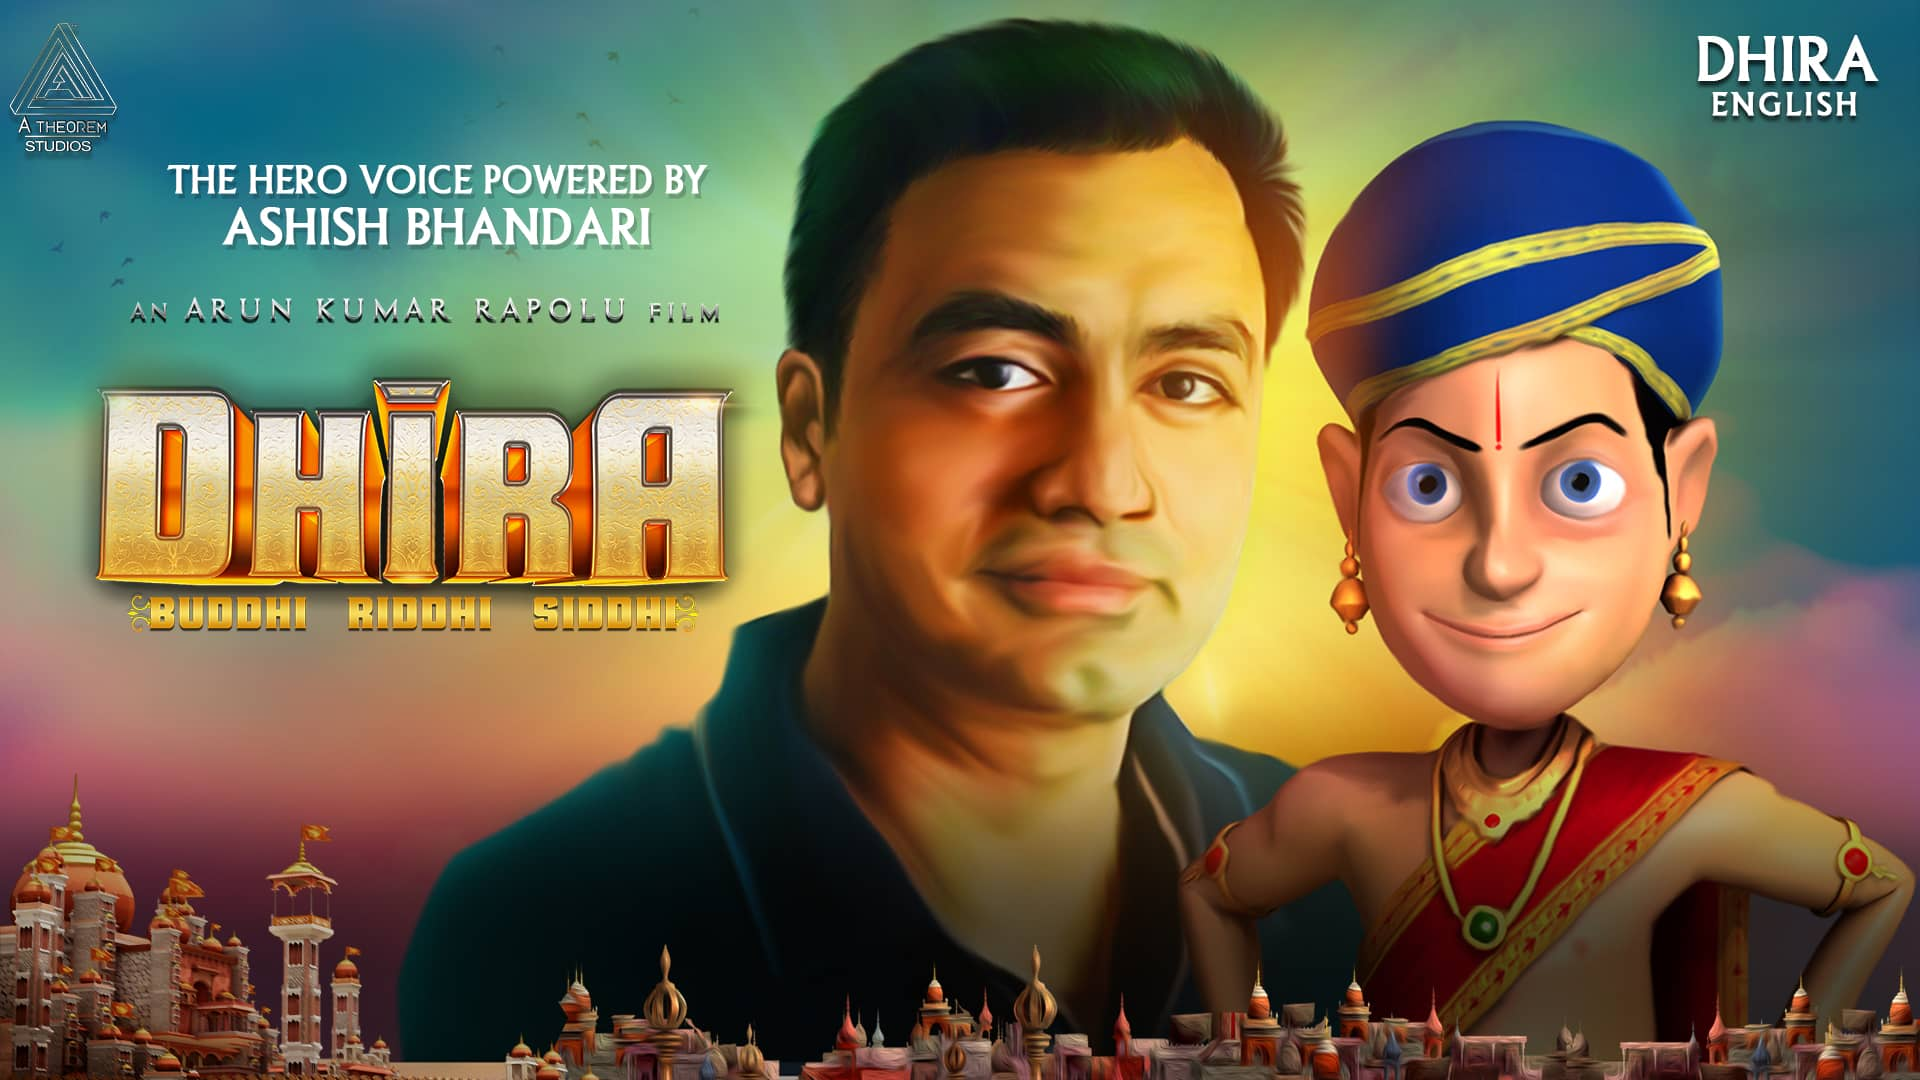 Dhira (English) Poster